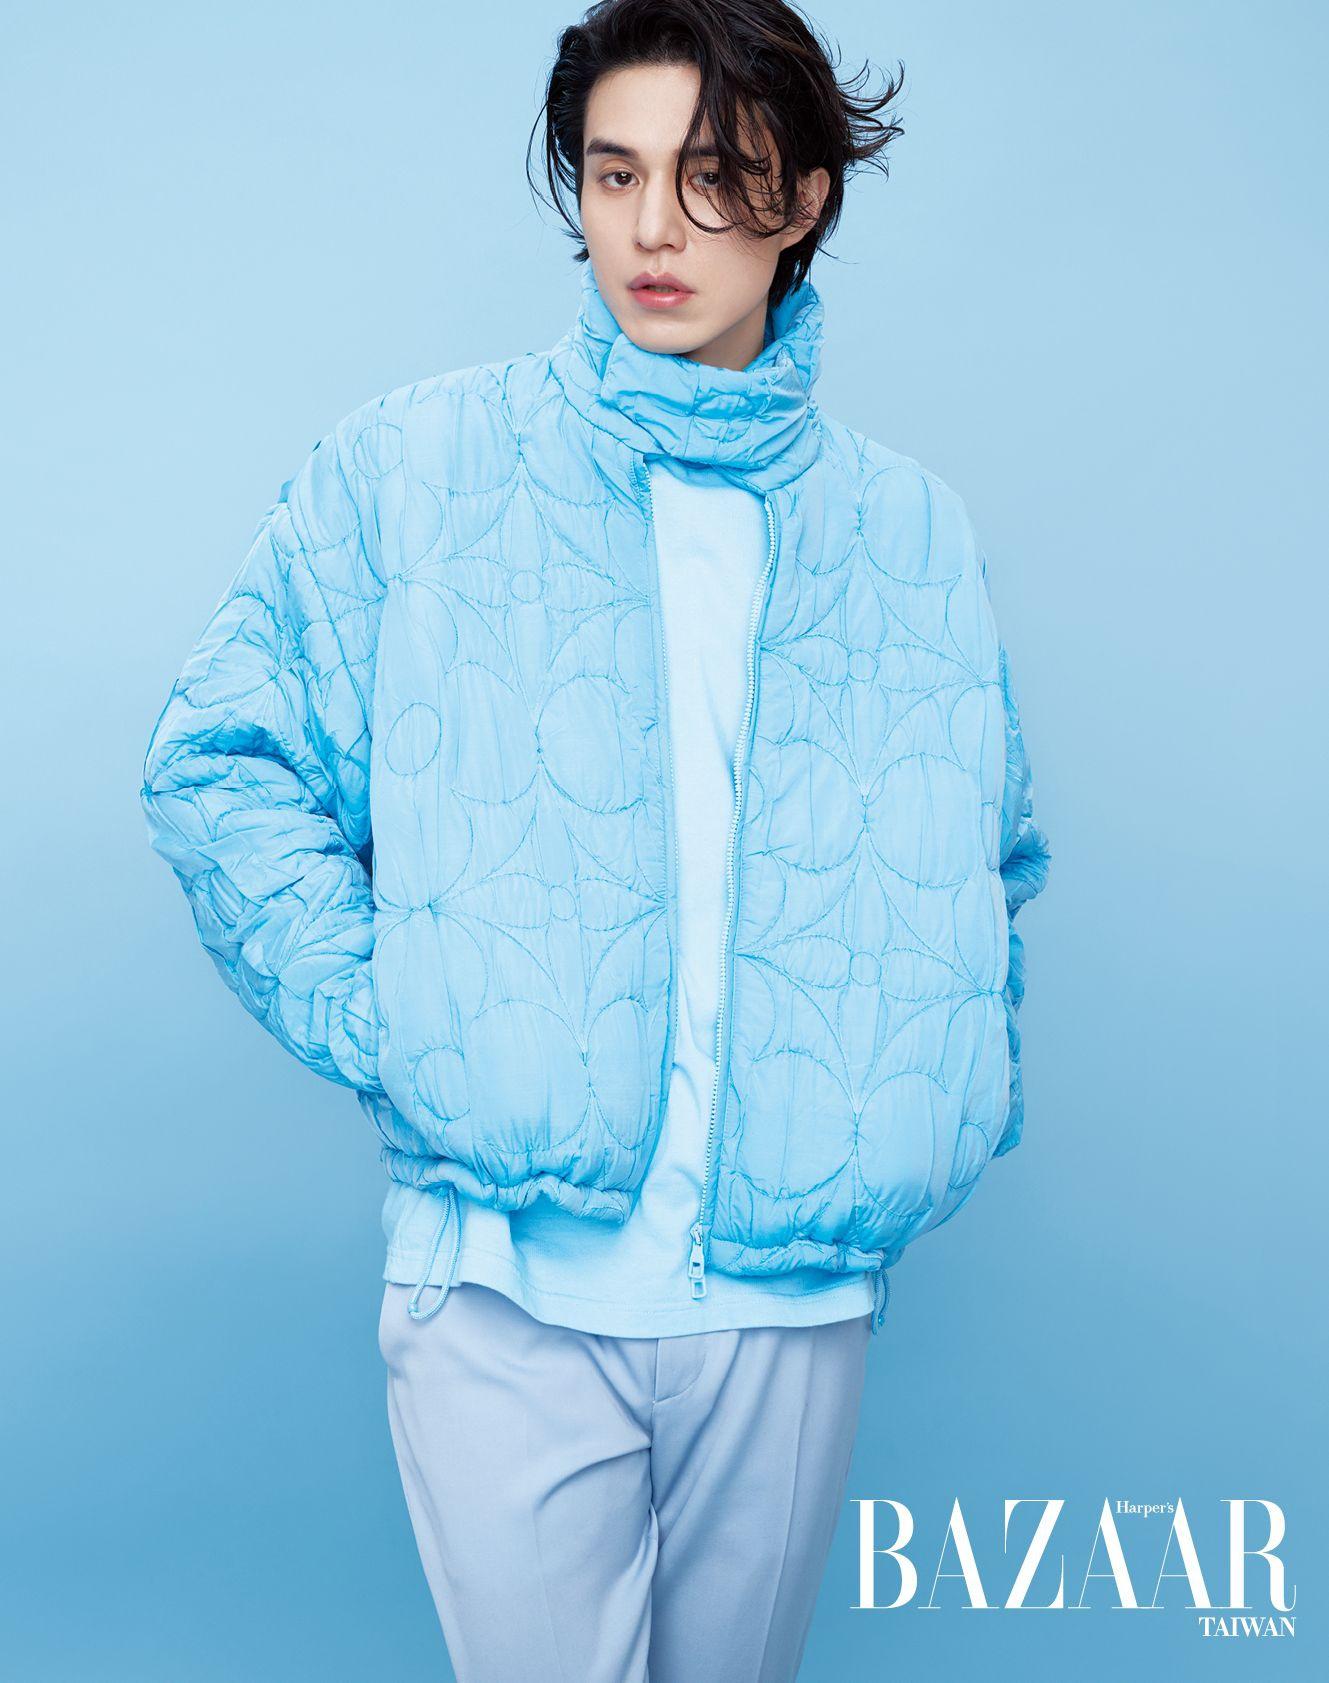 Lee Dong Wook duoc khen lang tu du de toc dai, mac suit hong nu tinh hinh anh 5 lee_dong_wook_harpers_bazaar_taiwan_man_march_2020_05.jpg